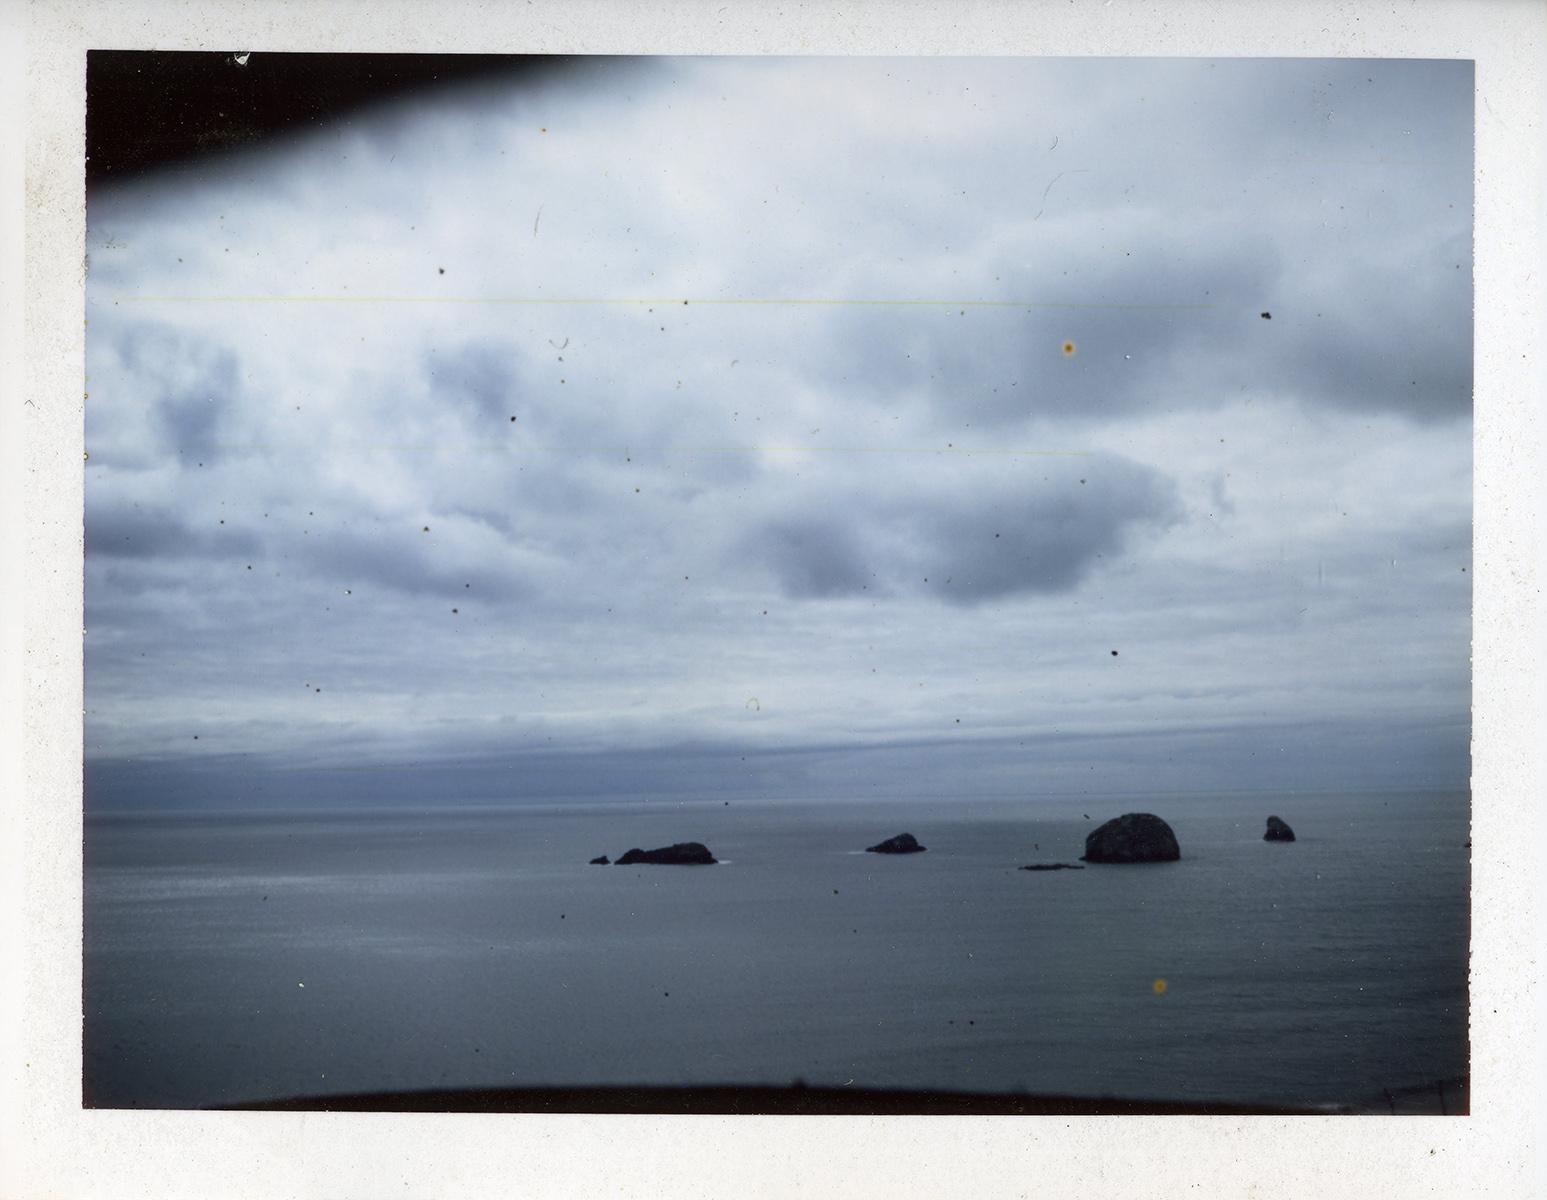 polaroid021 copy.jpg